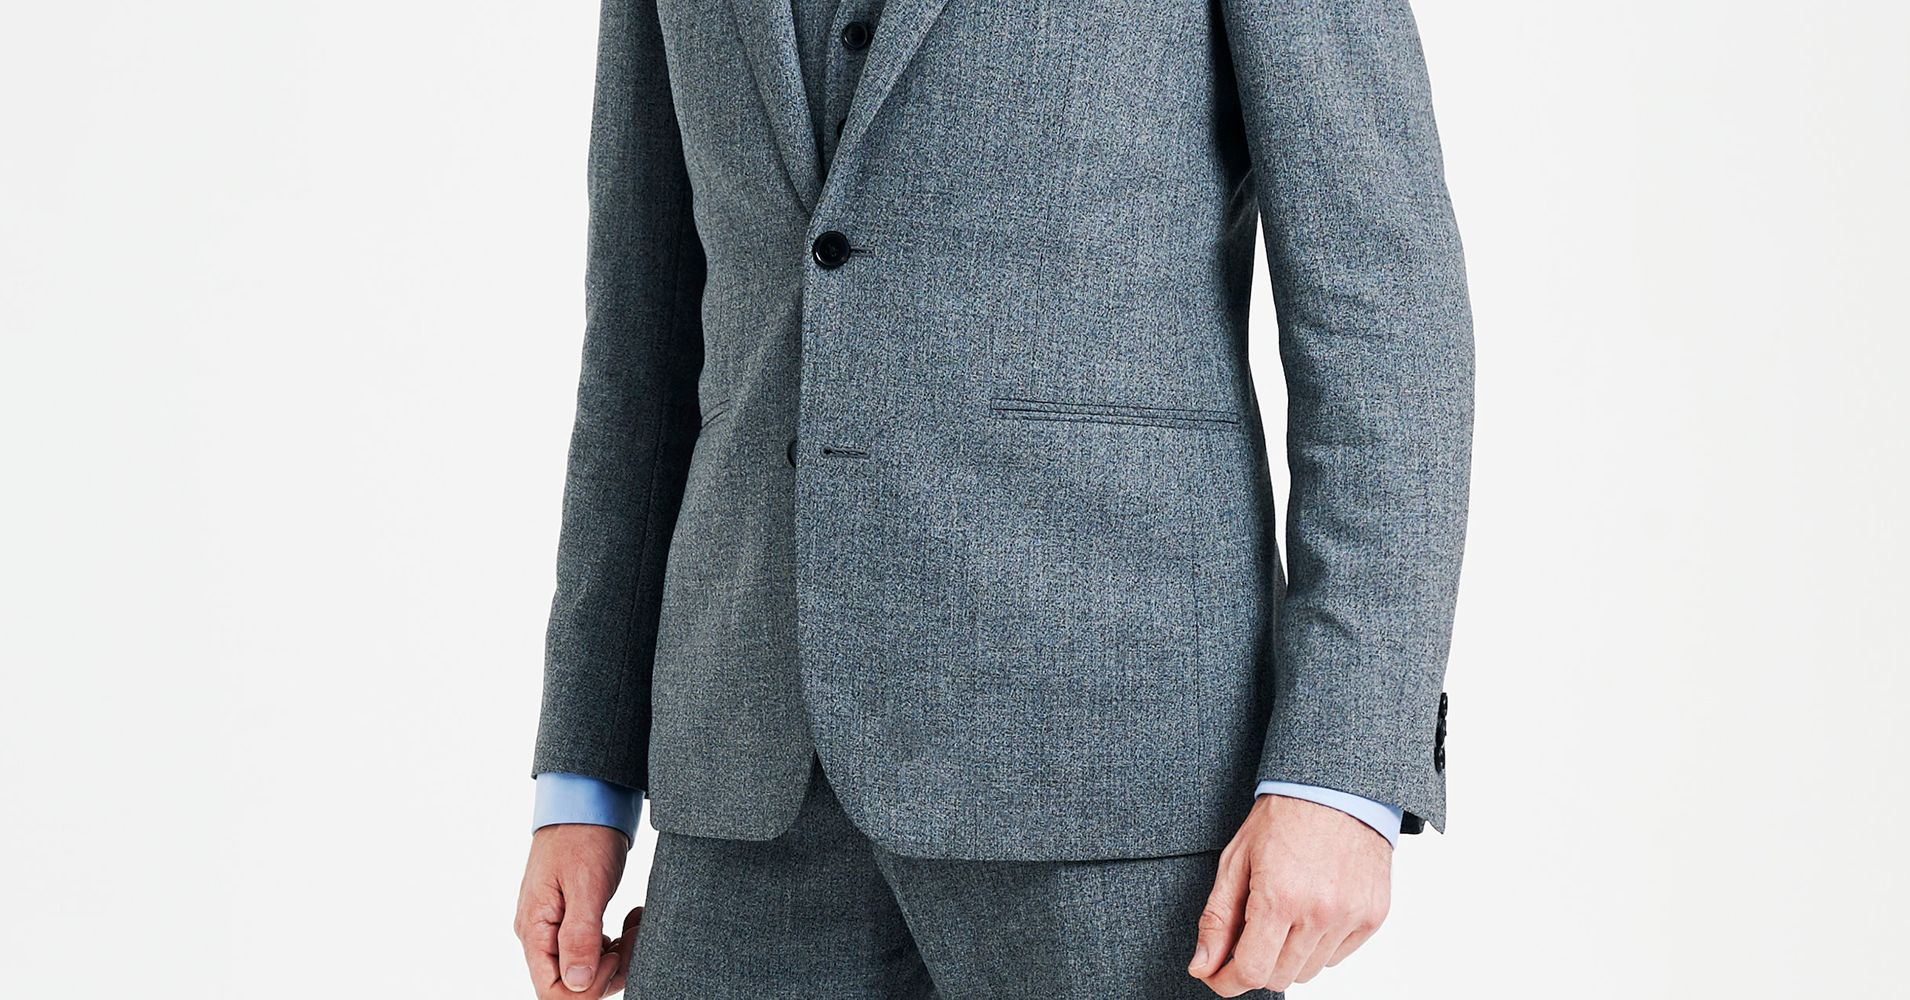 Mens jacket button rules - Mens Jacket Button Rules 45